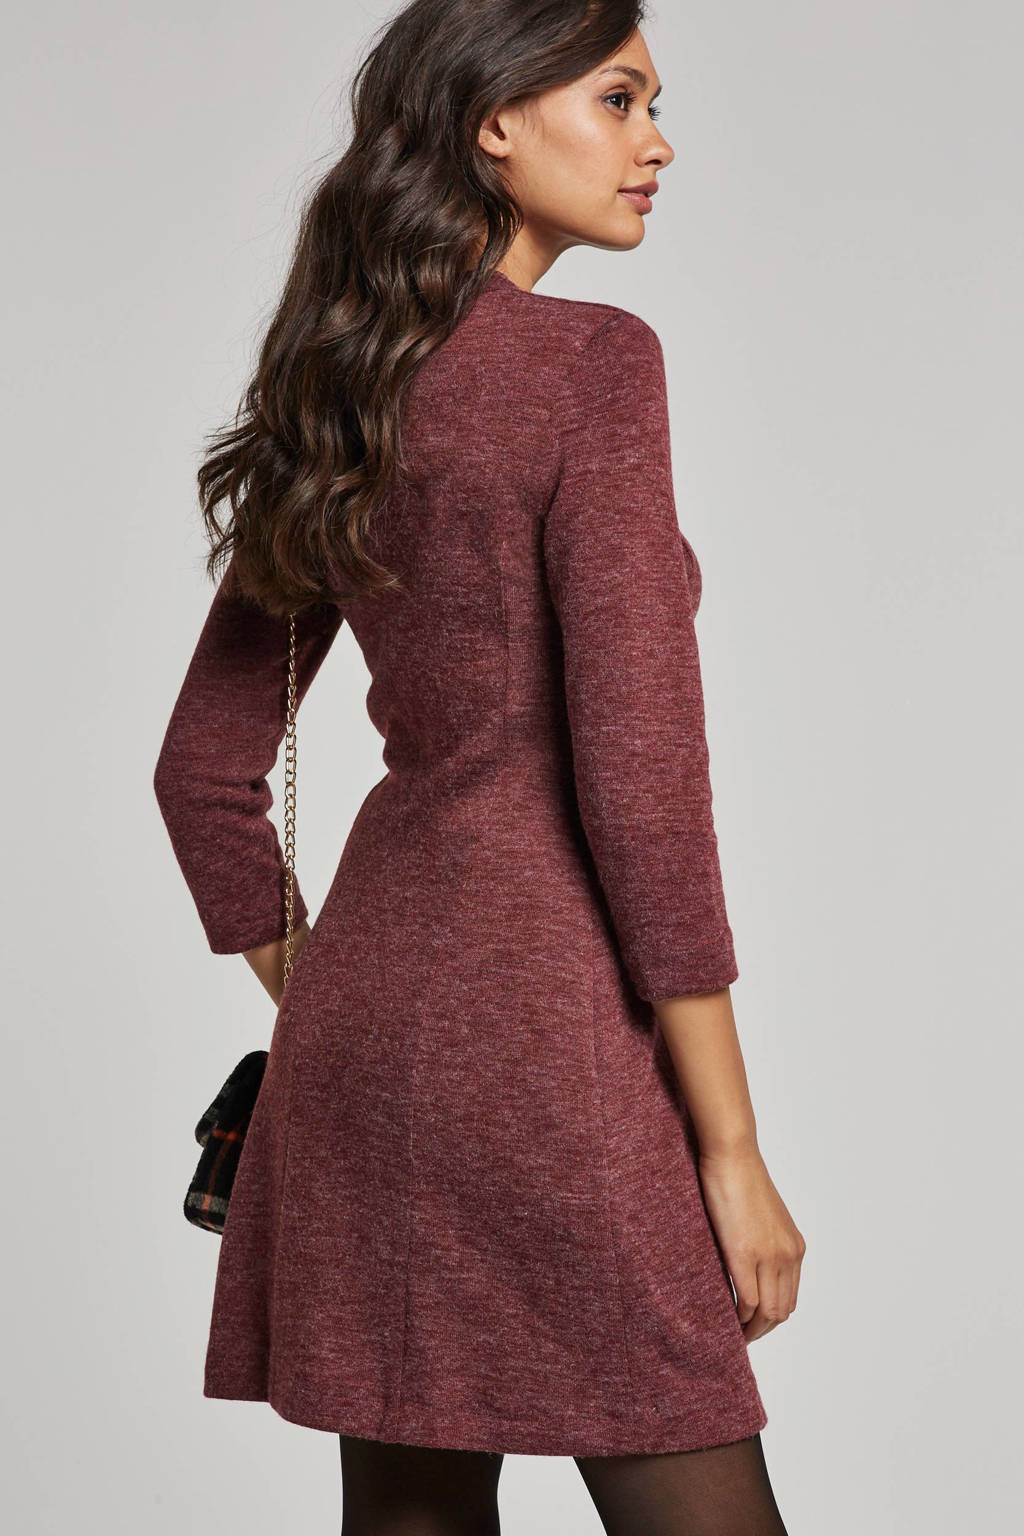 7c12f01270560c ESPRIT Women Casual gemêleerde jurk